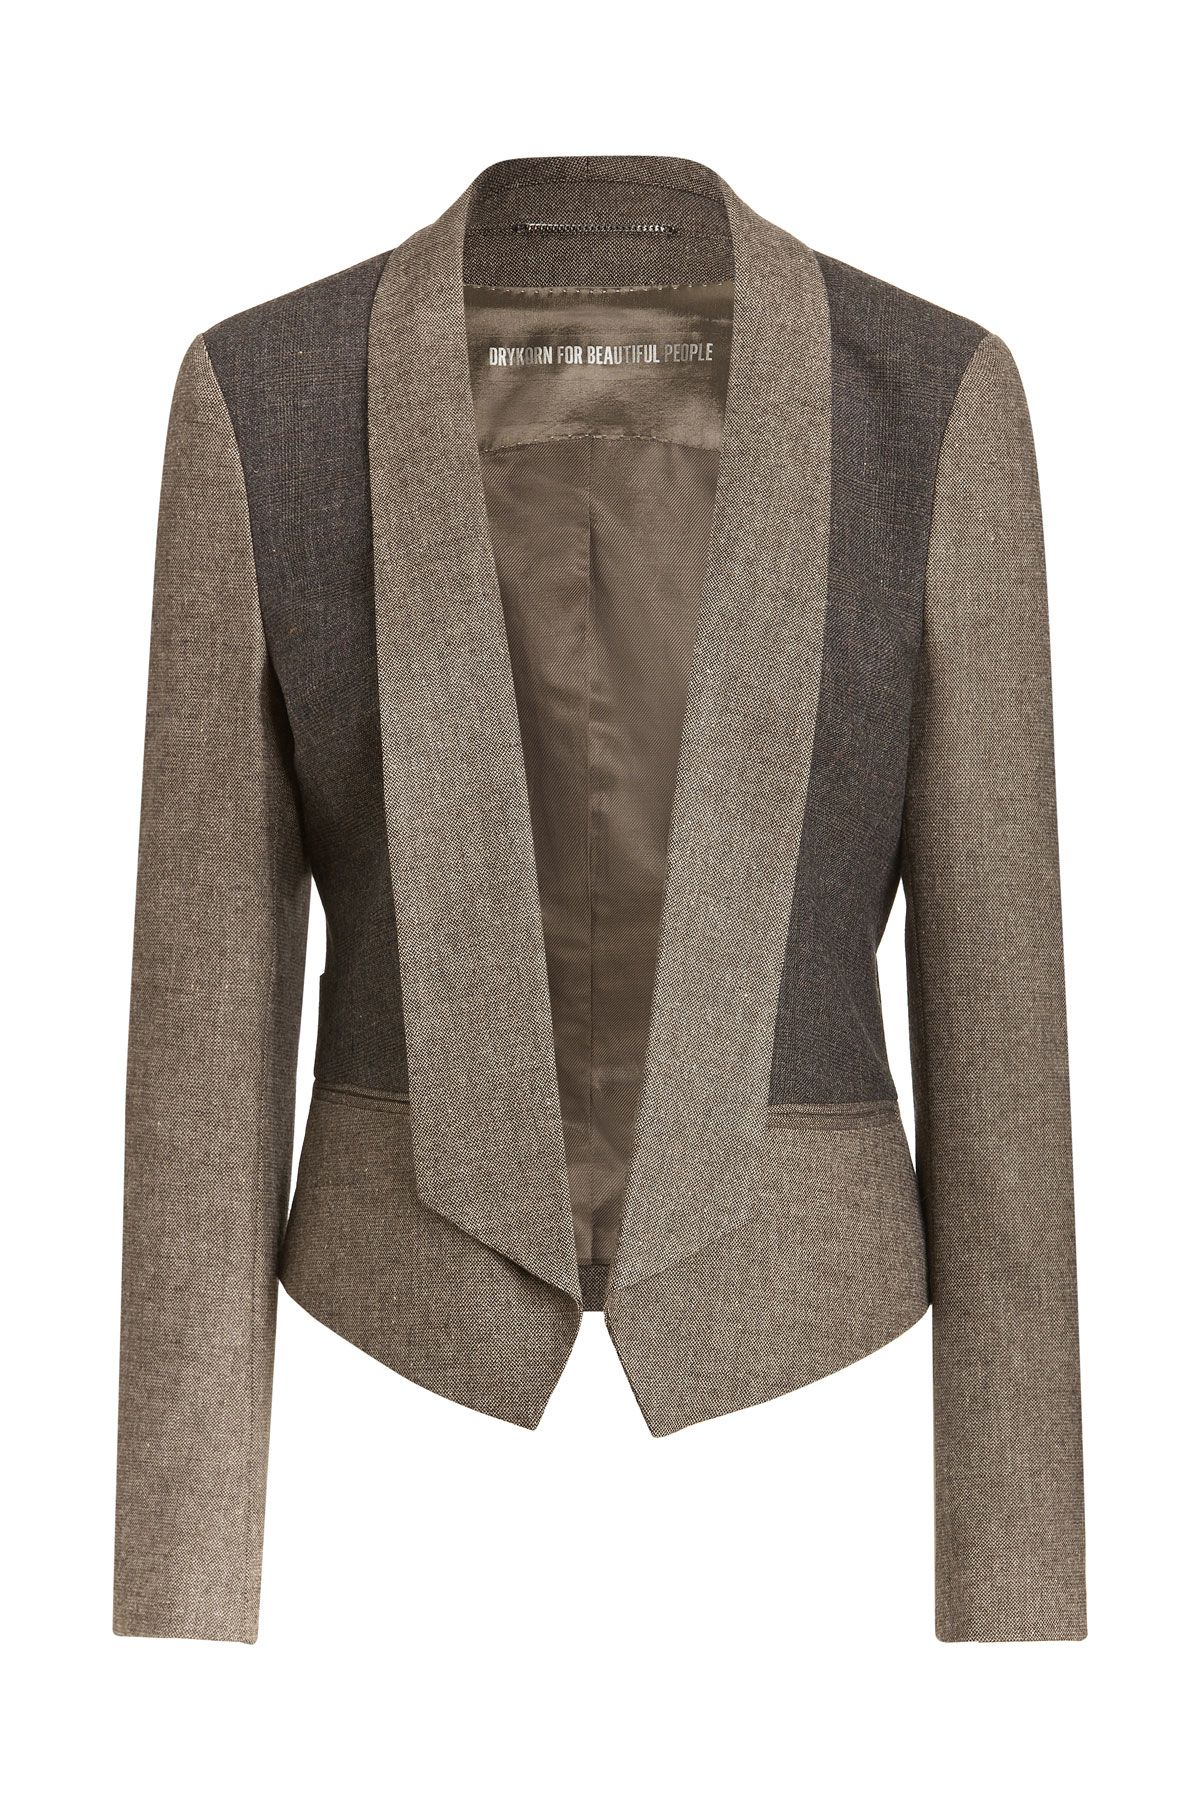 Love A Good Blazer | Fashionista | Pinterest